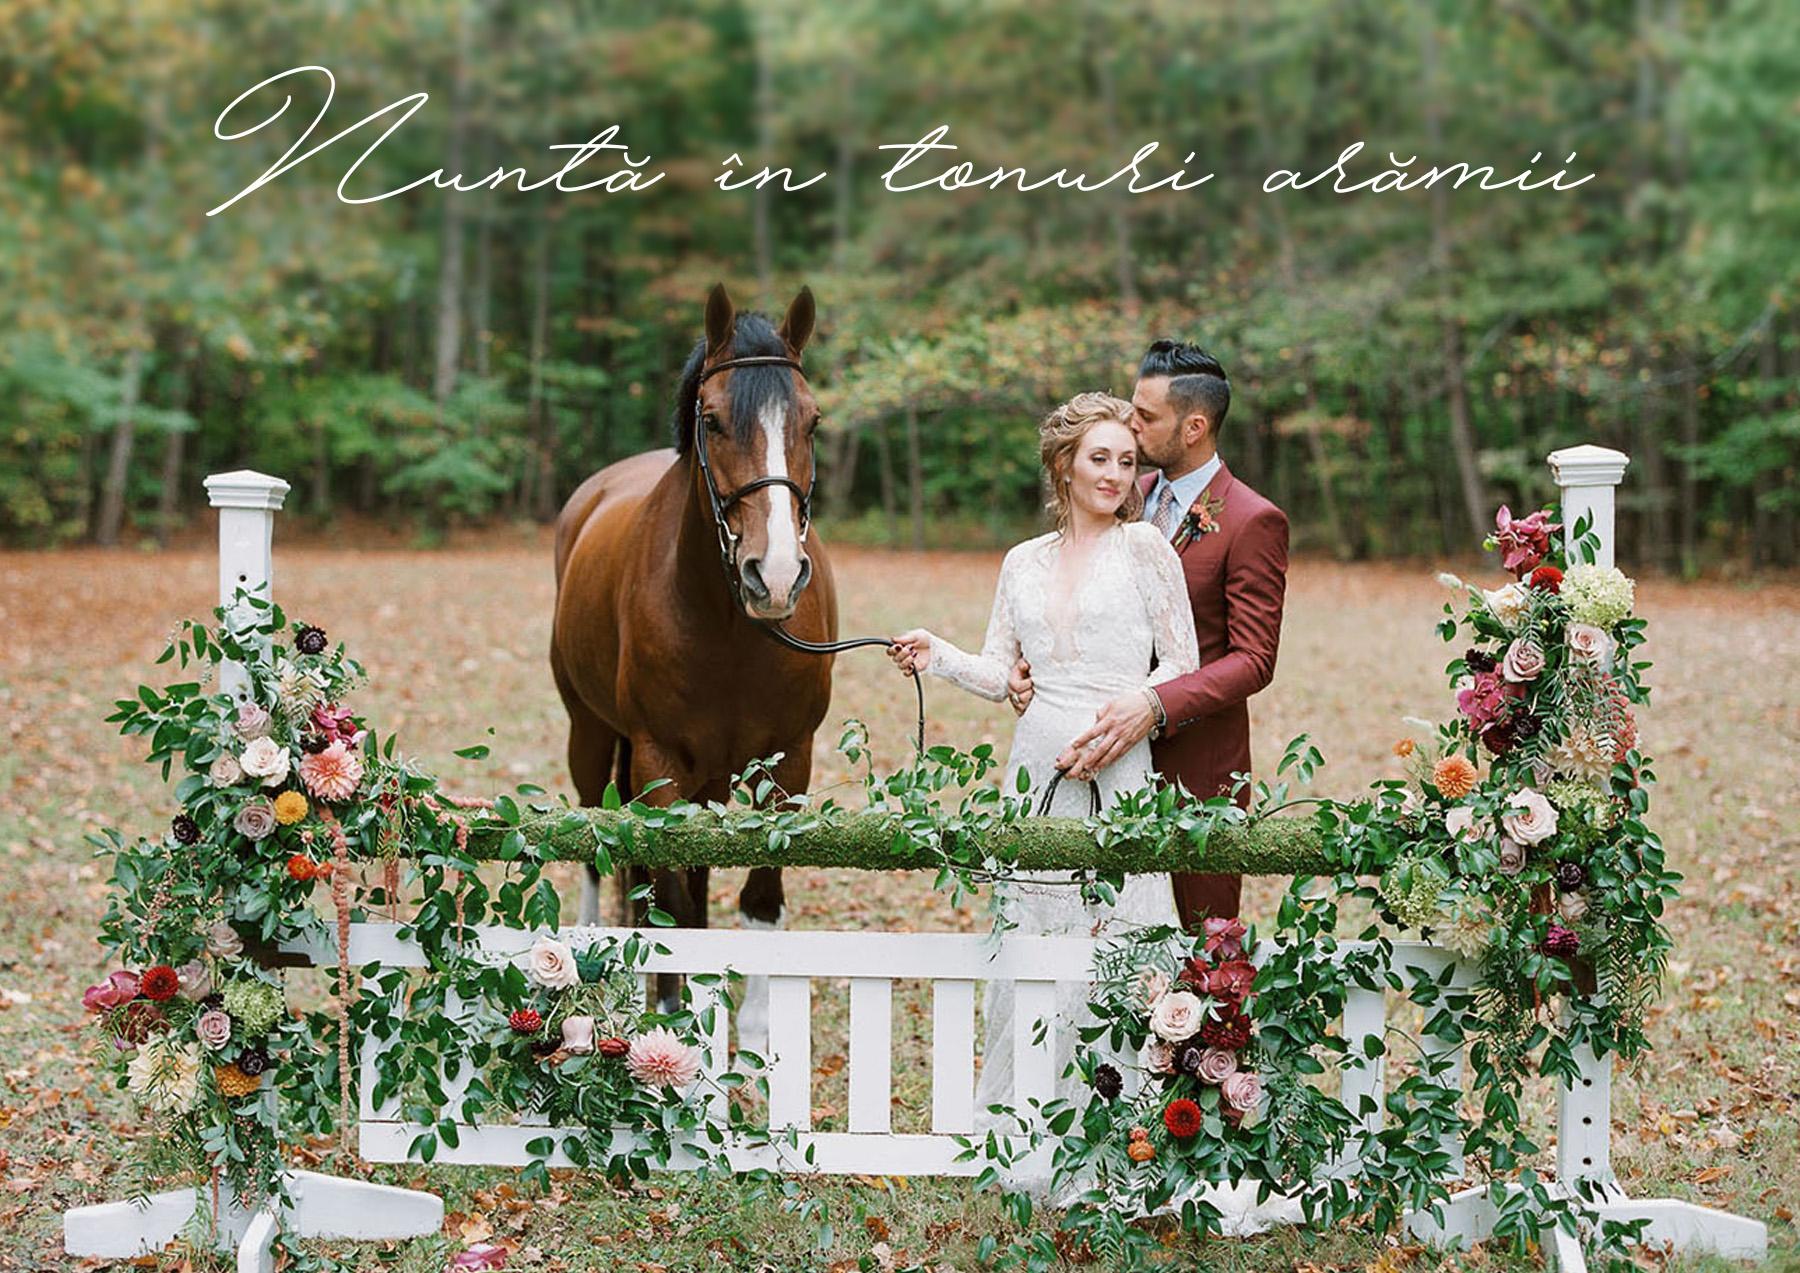 Nunta in tonuri aramii. Idei de invitatii de nunta de toamna!